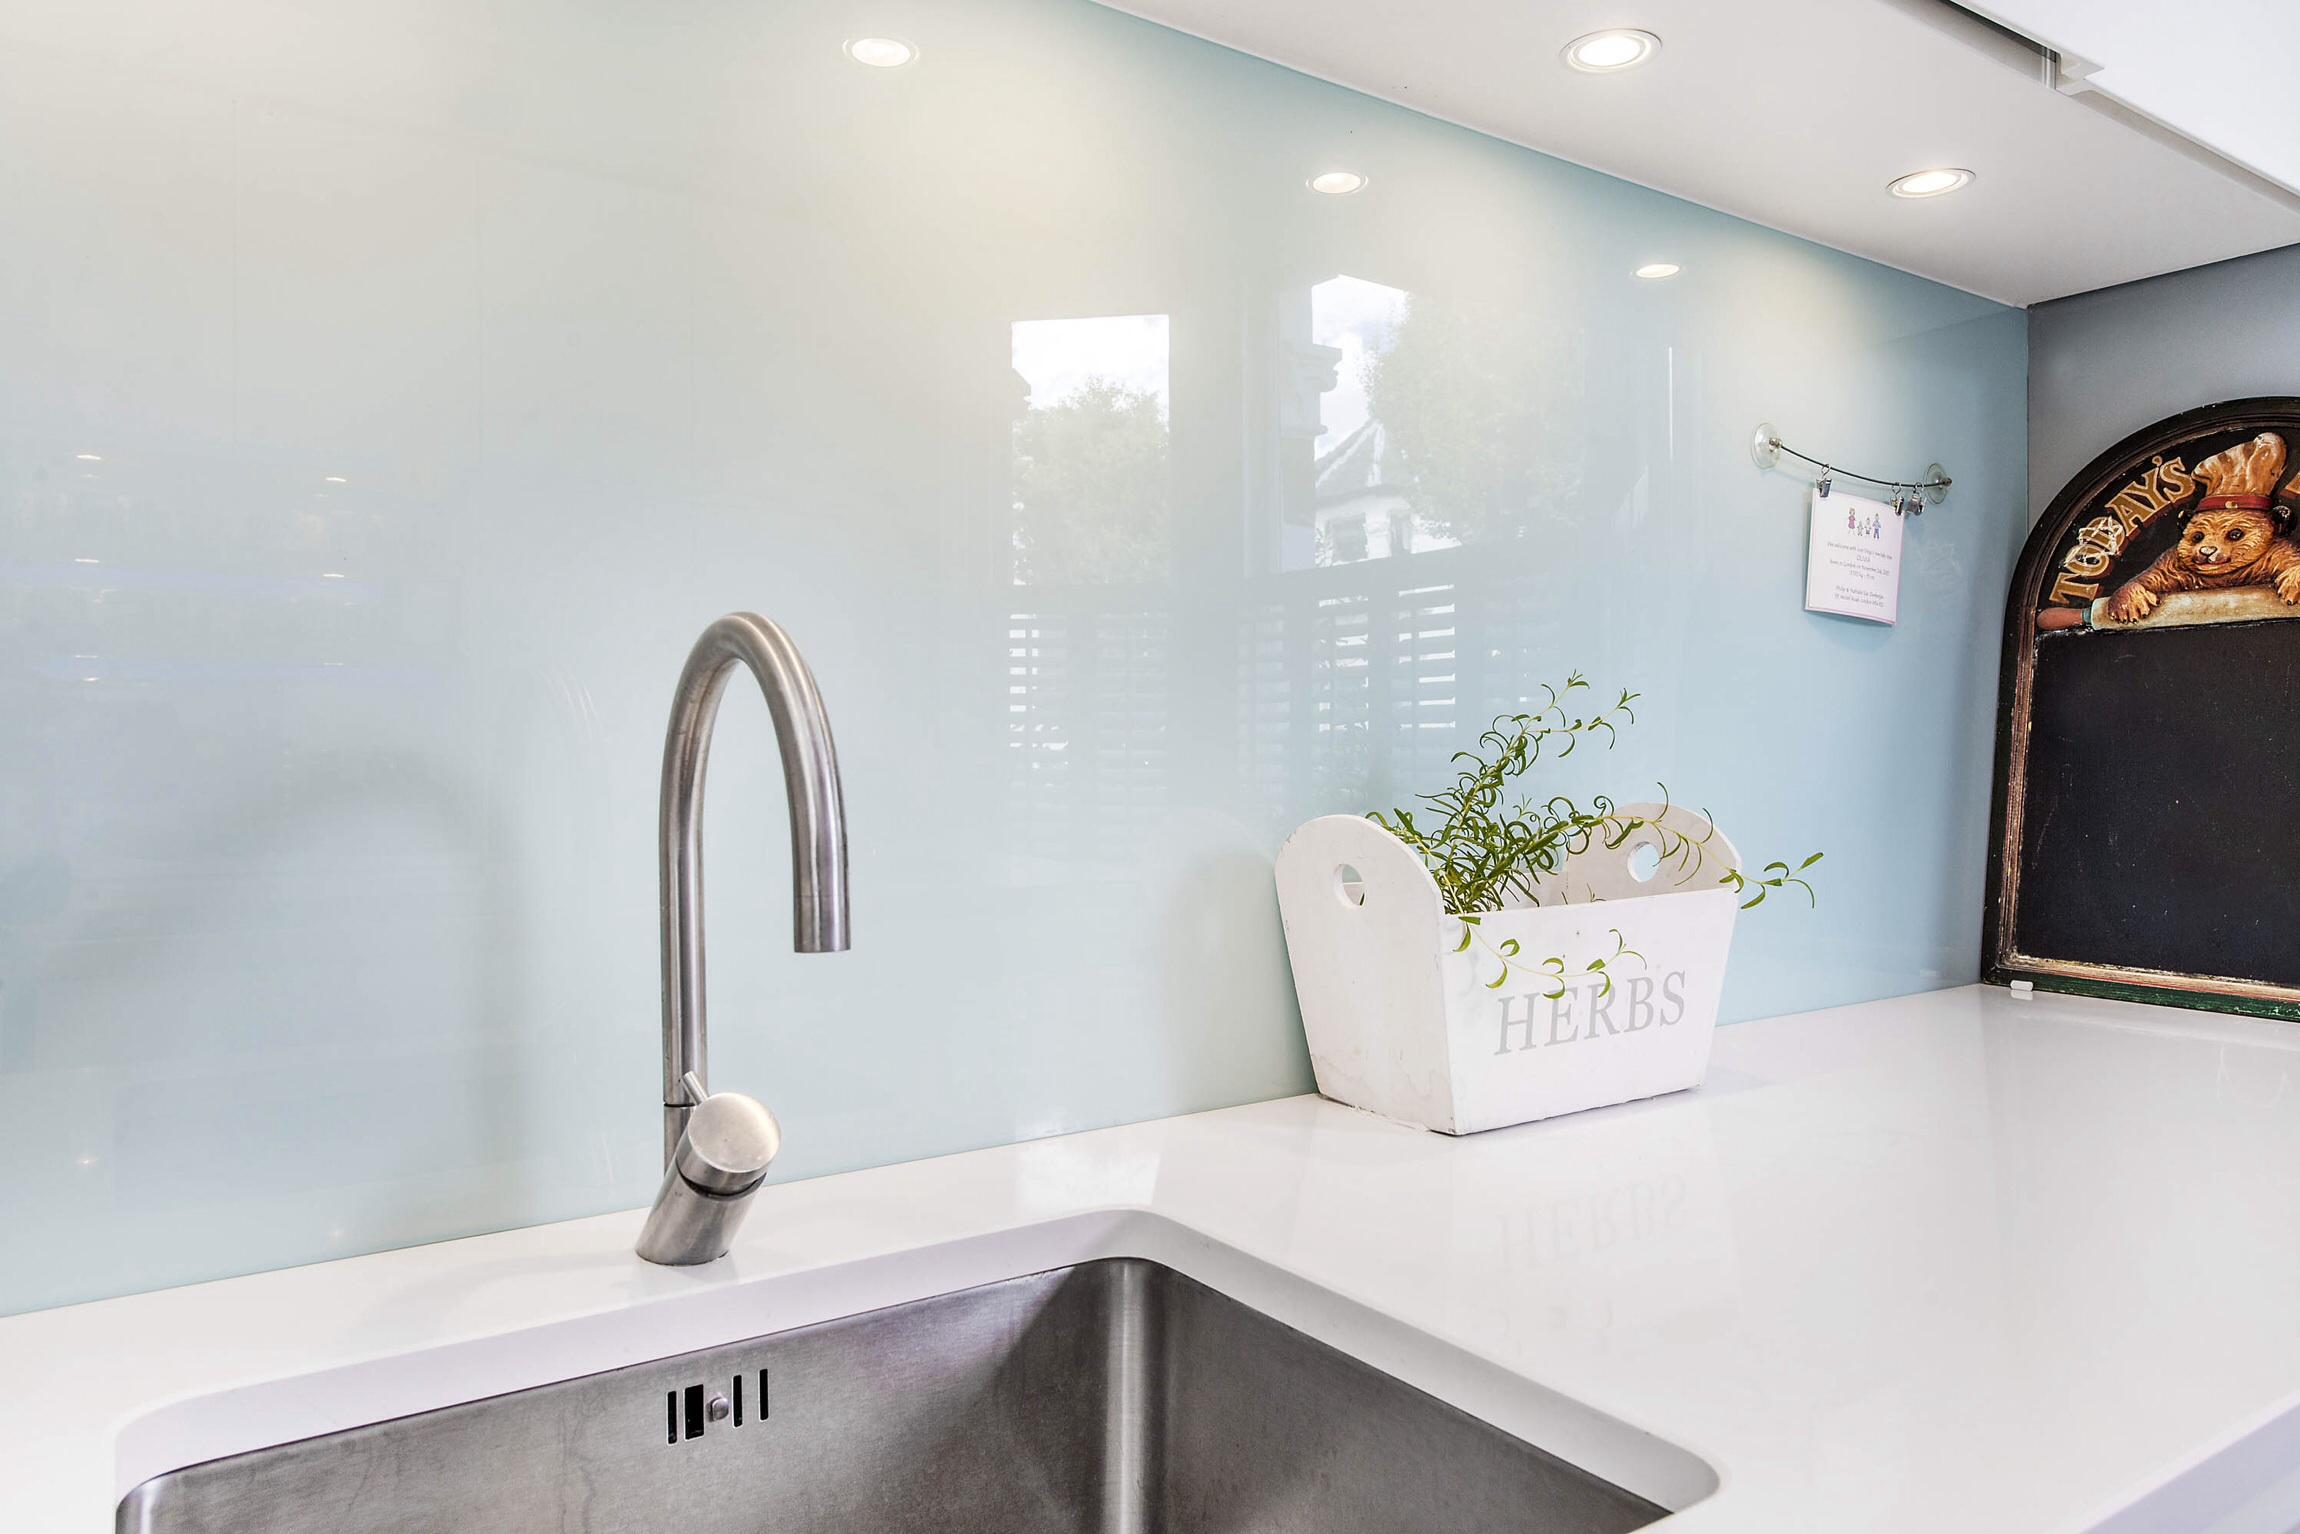 Glass Splashbacks Bathroom Walls Decoglaze Colour Coated Glass Splashbacks And Worktops For Your